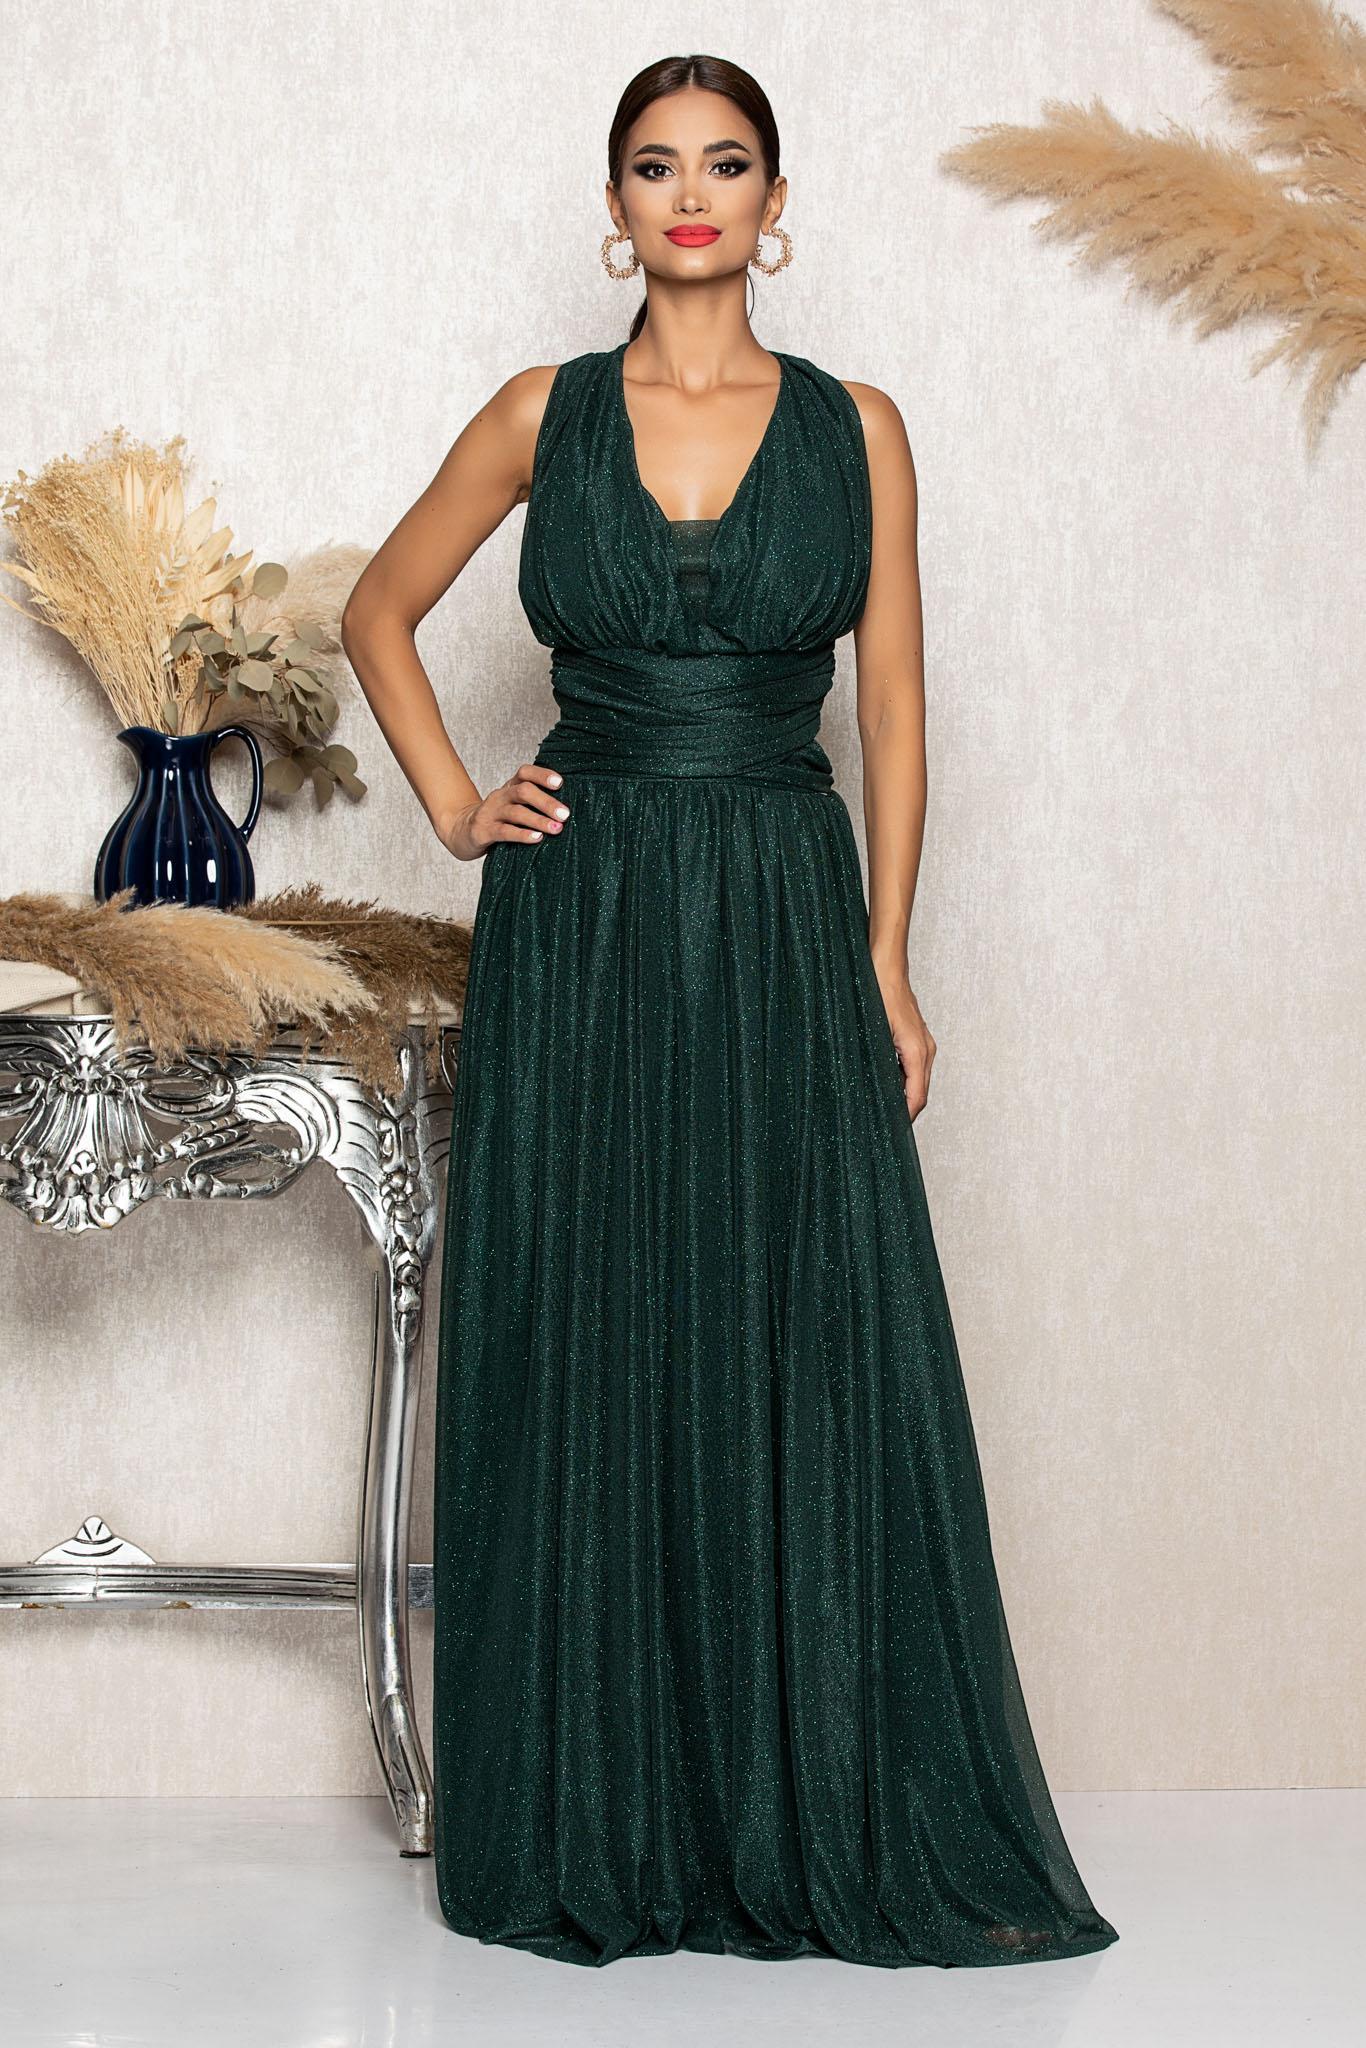 Rochie Sophisticated Verde Marimi Mari M (38)   L (40)   XL (42)   XXL (44)   3XL (46)